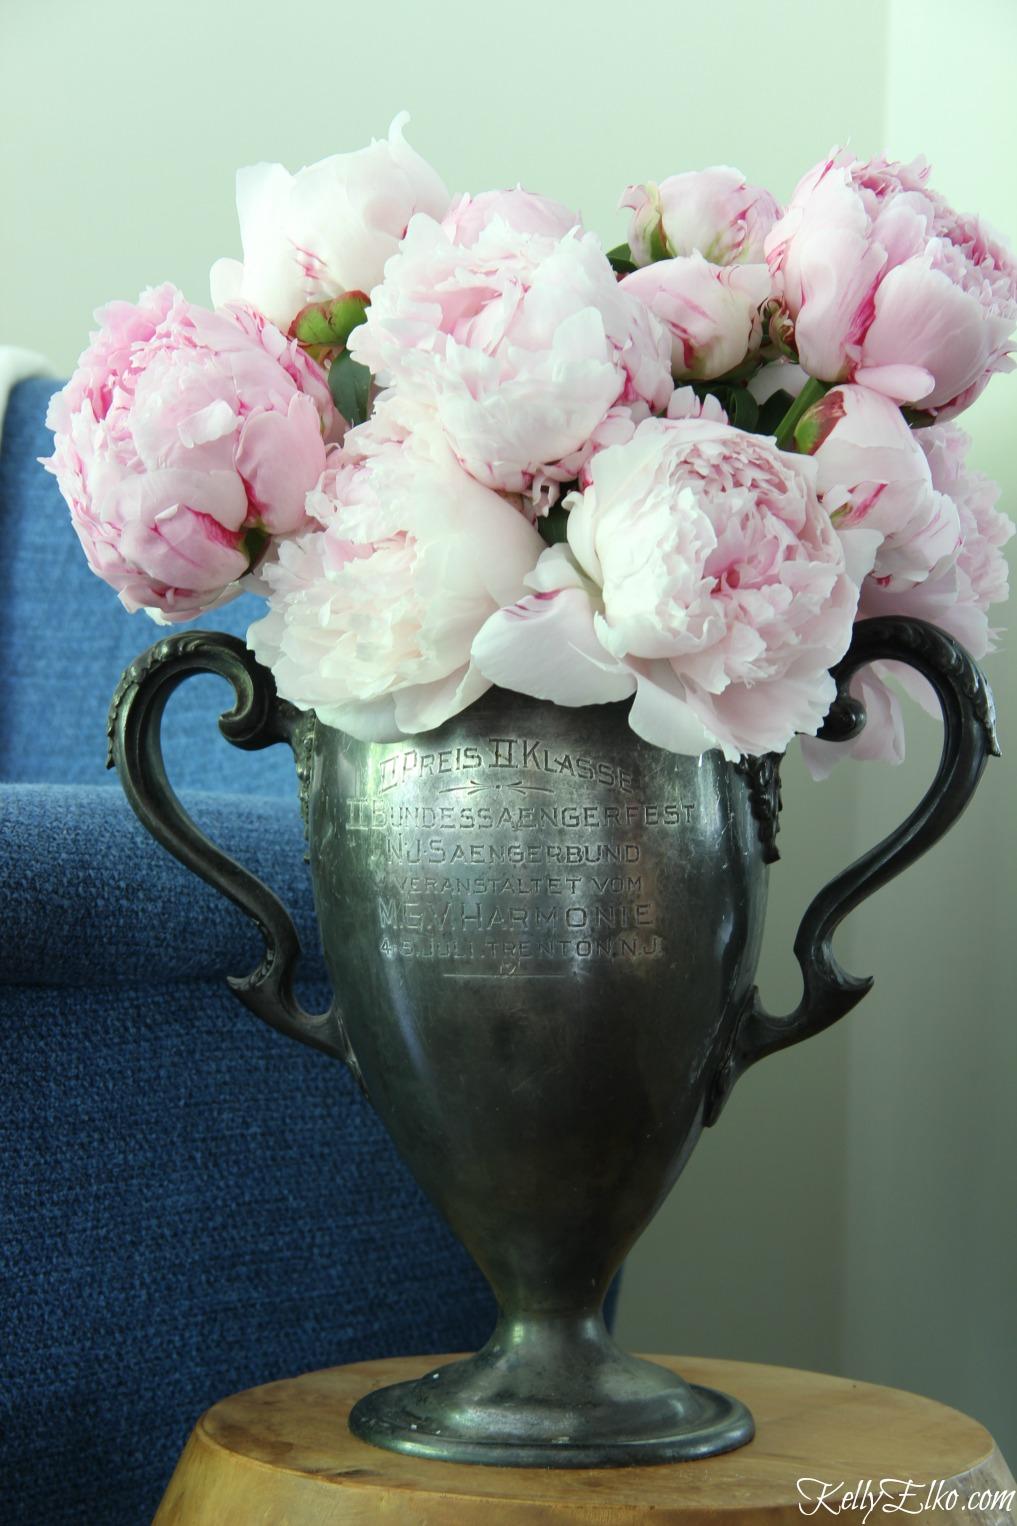 Pink peonies in an antique trophy! kellyelko.com